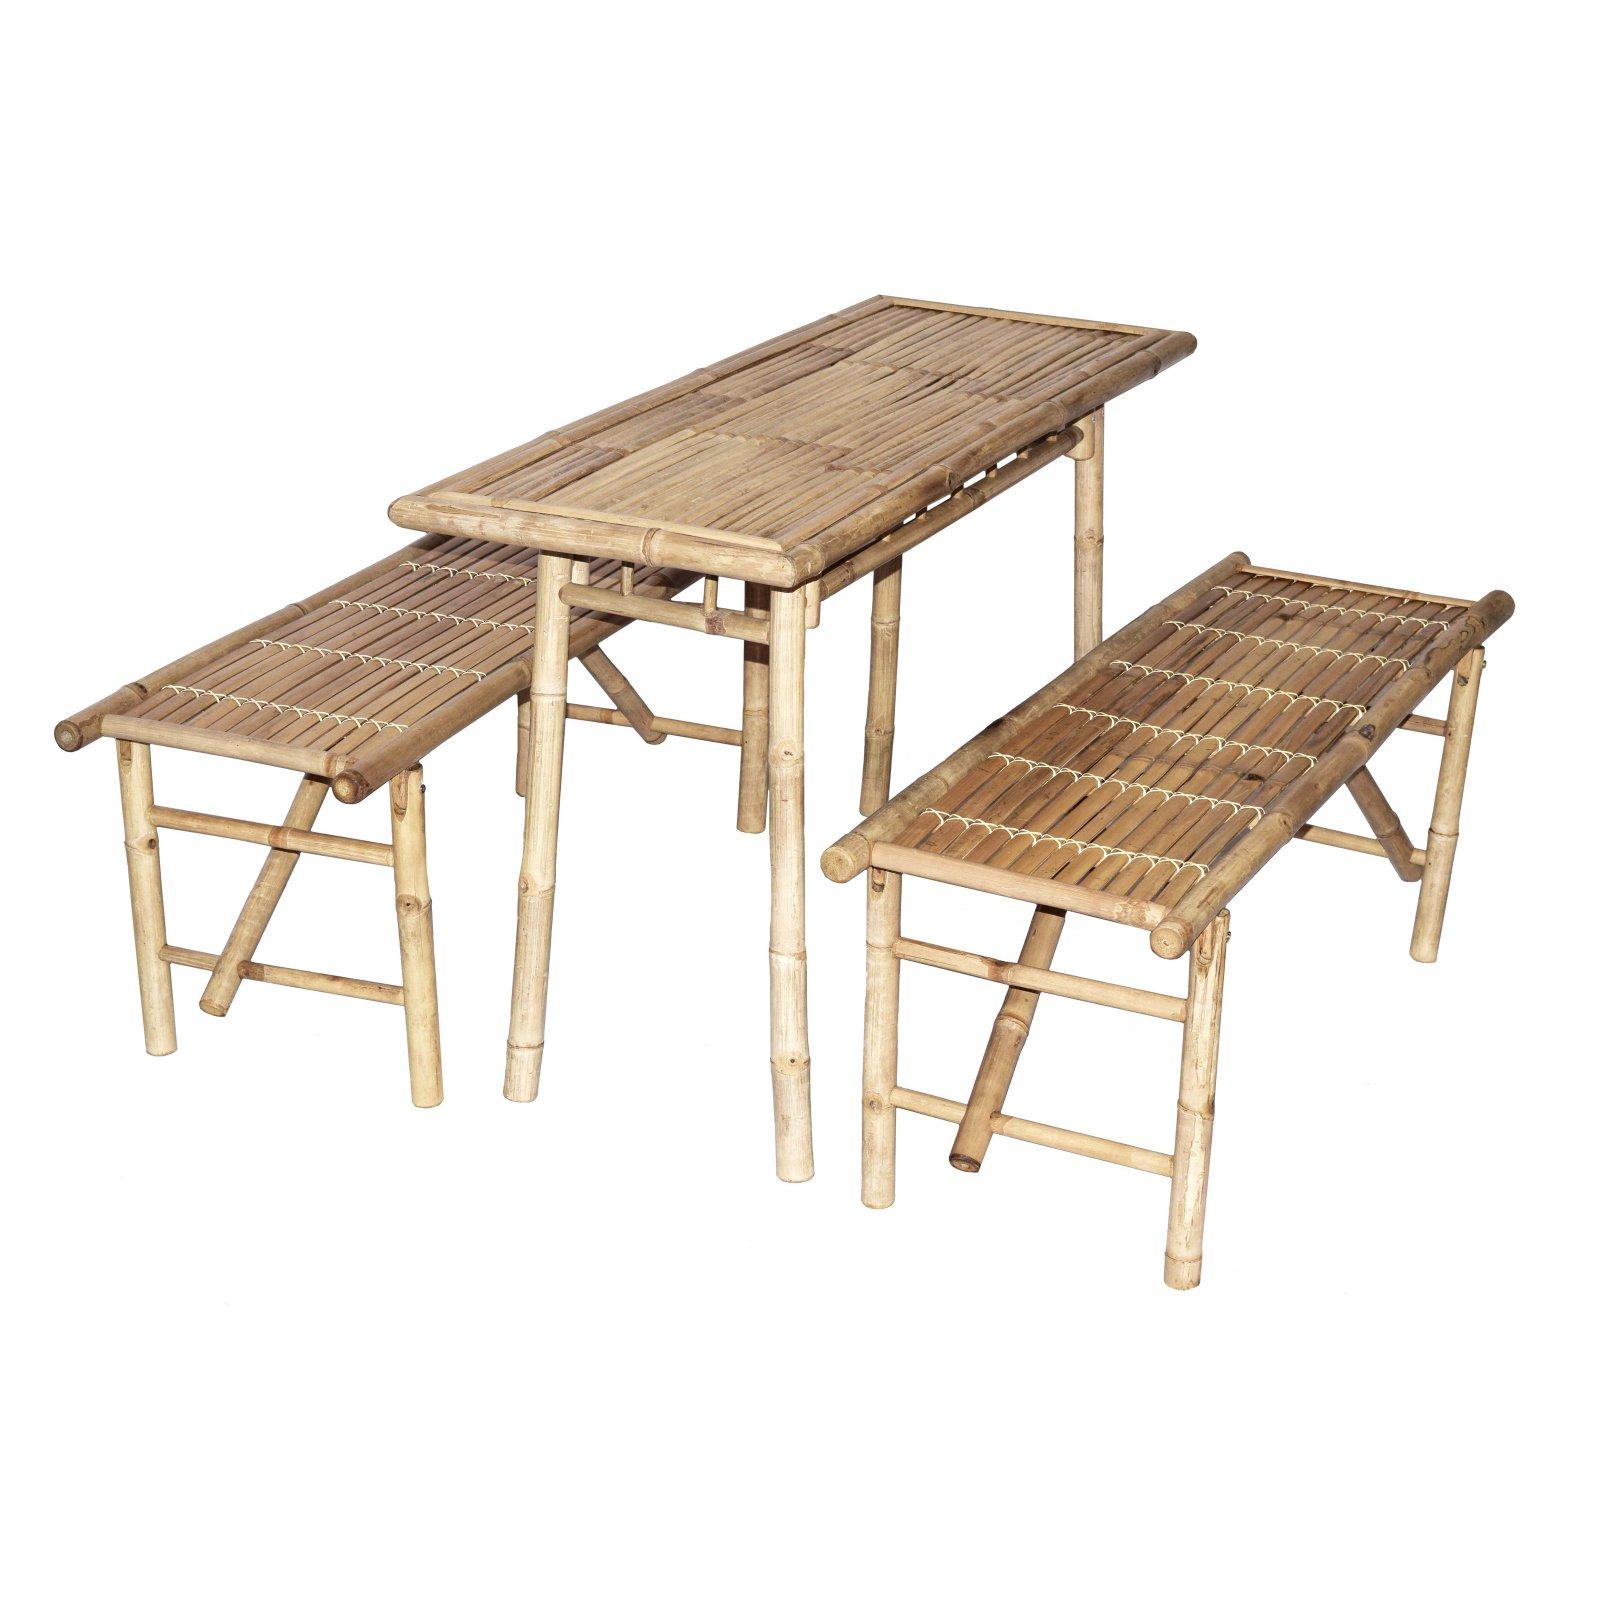 Bamboo54 Folding Bamboo Picnic Table by Bamboo54